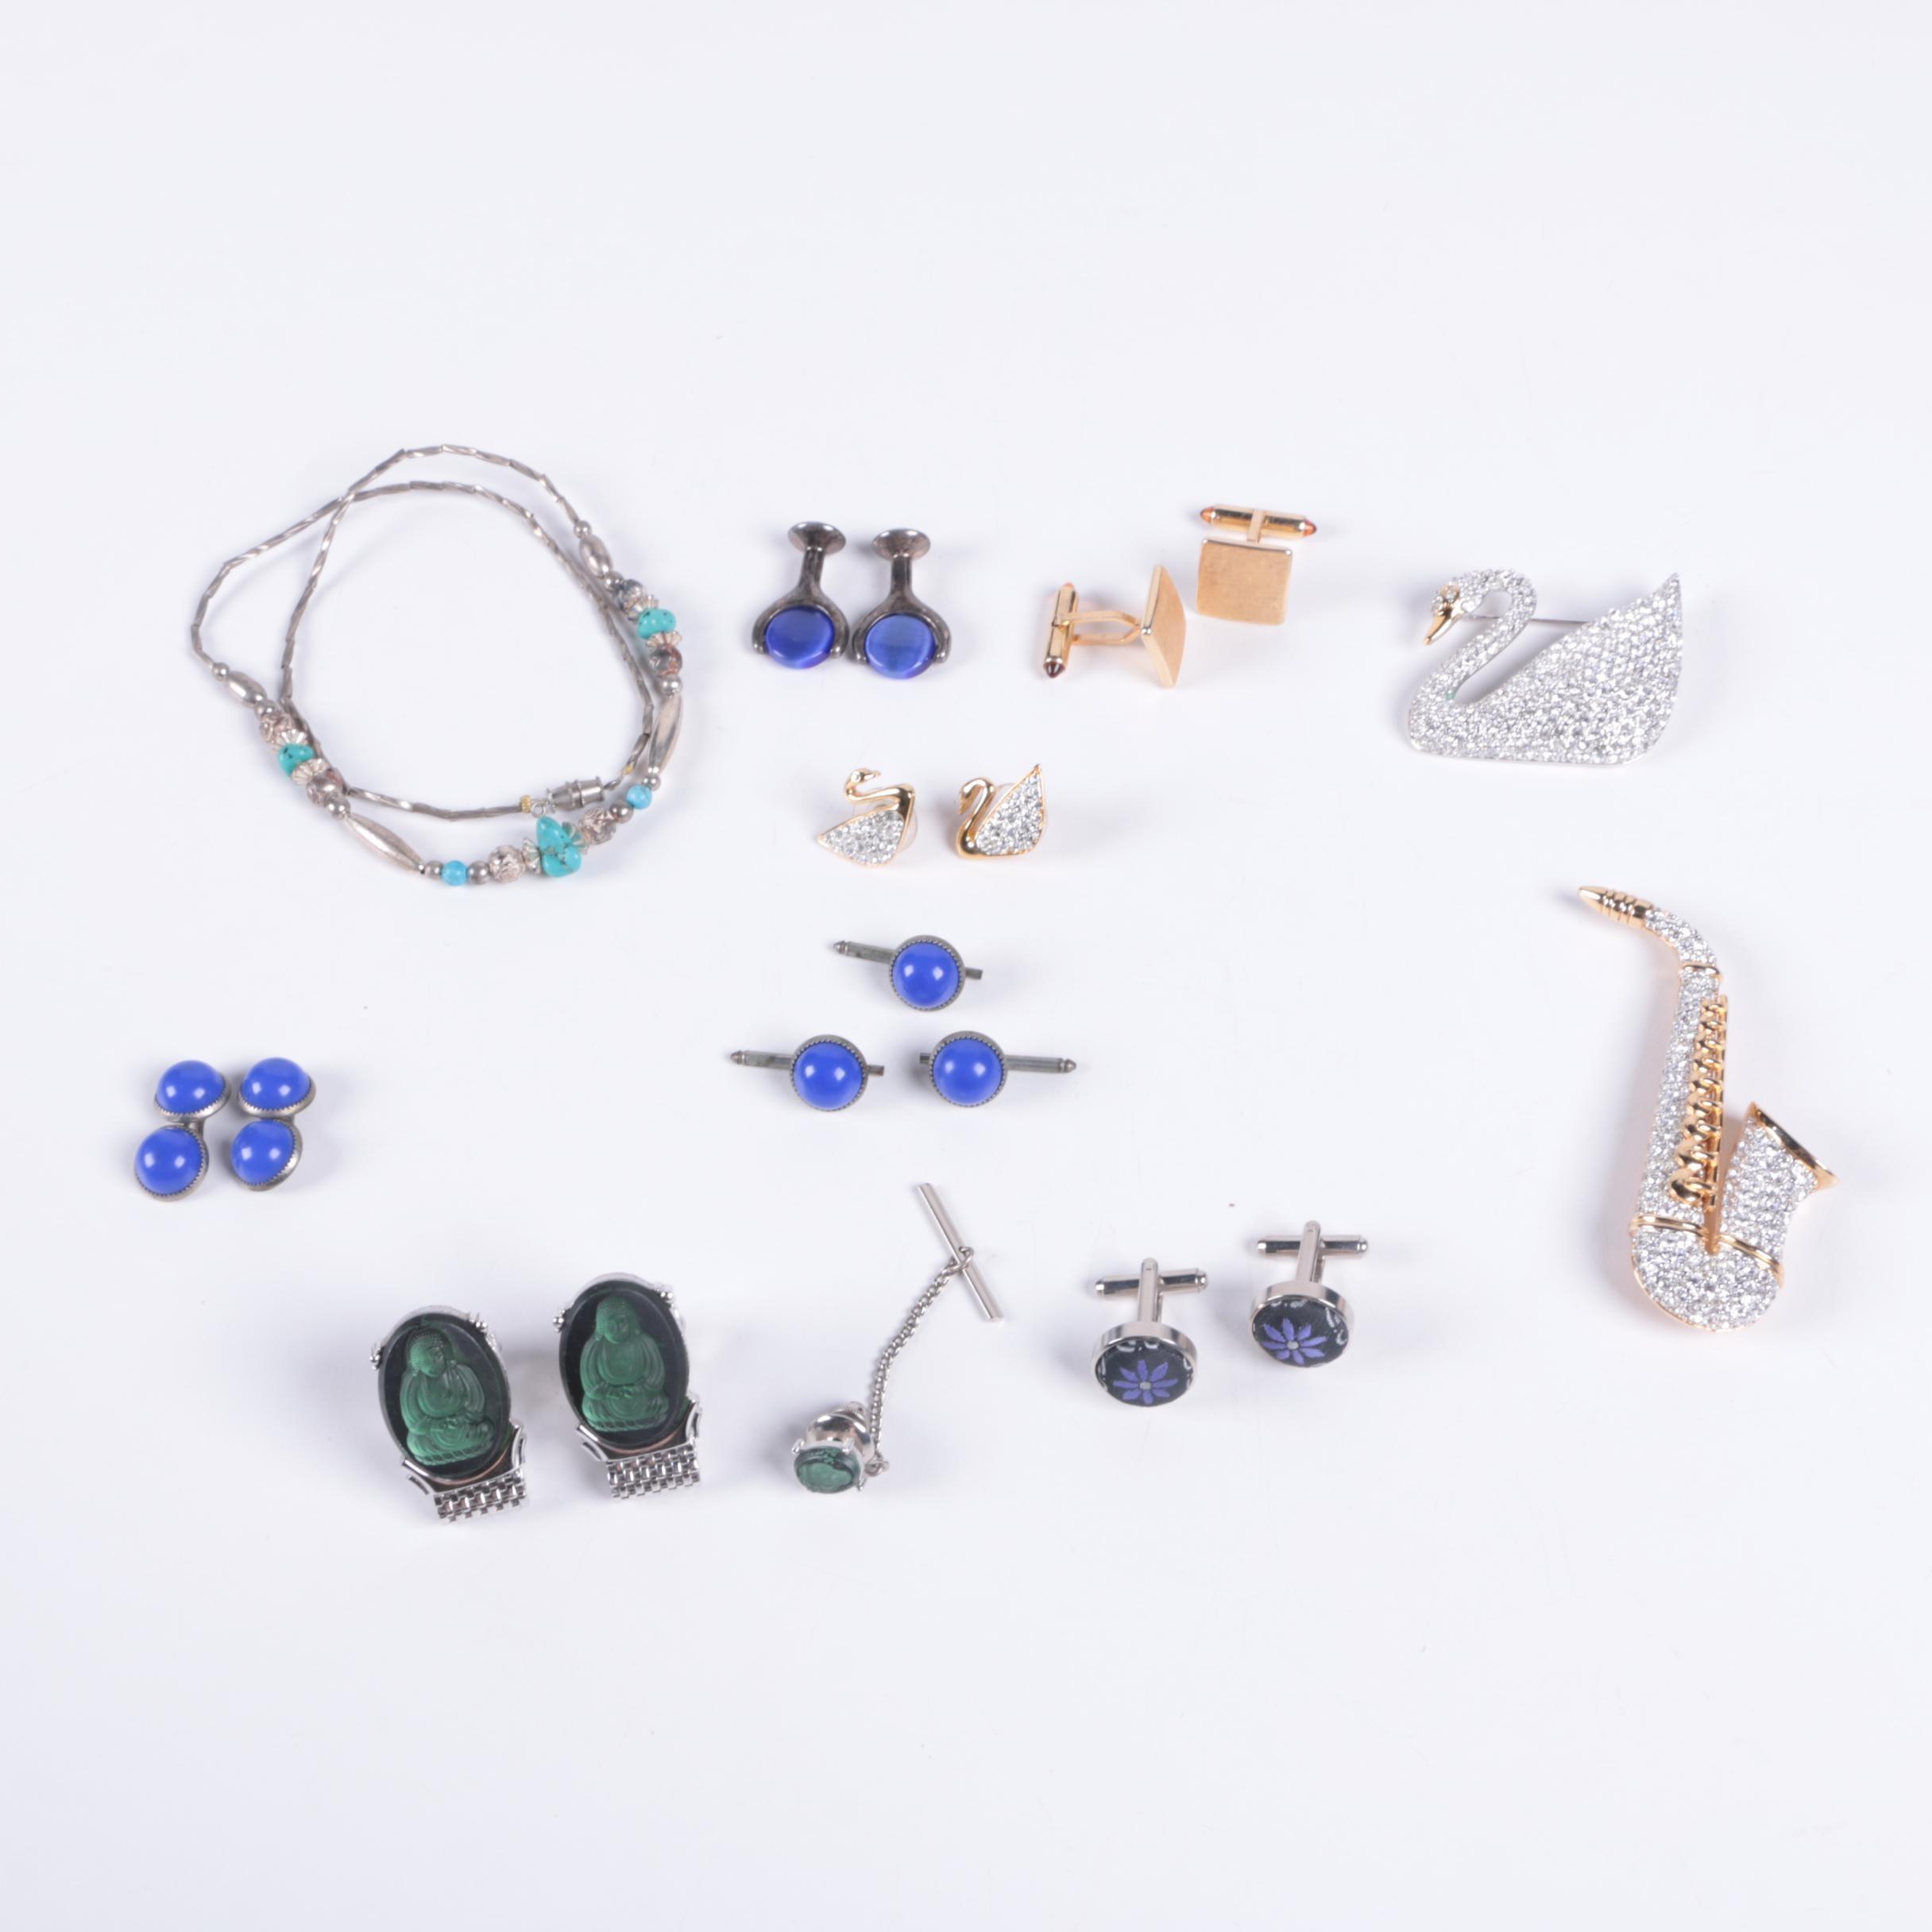 Assortment of Costume Jewelry Including Swarovski and Krementz